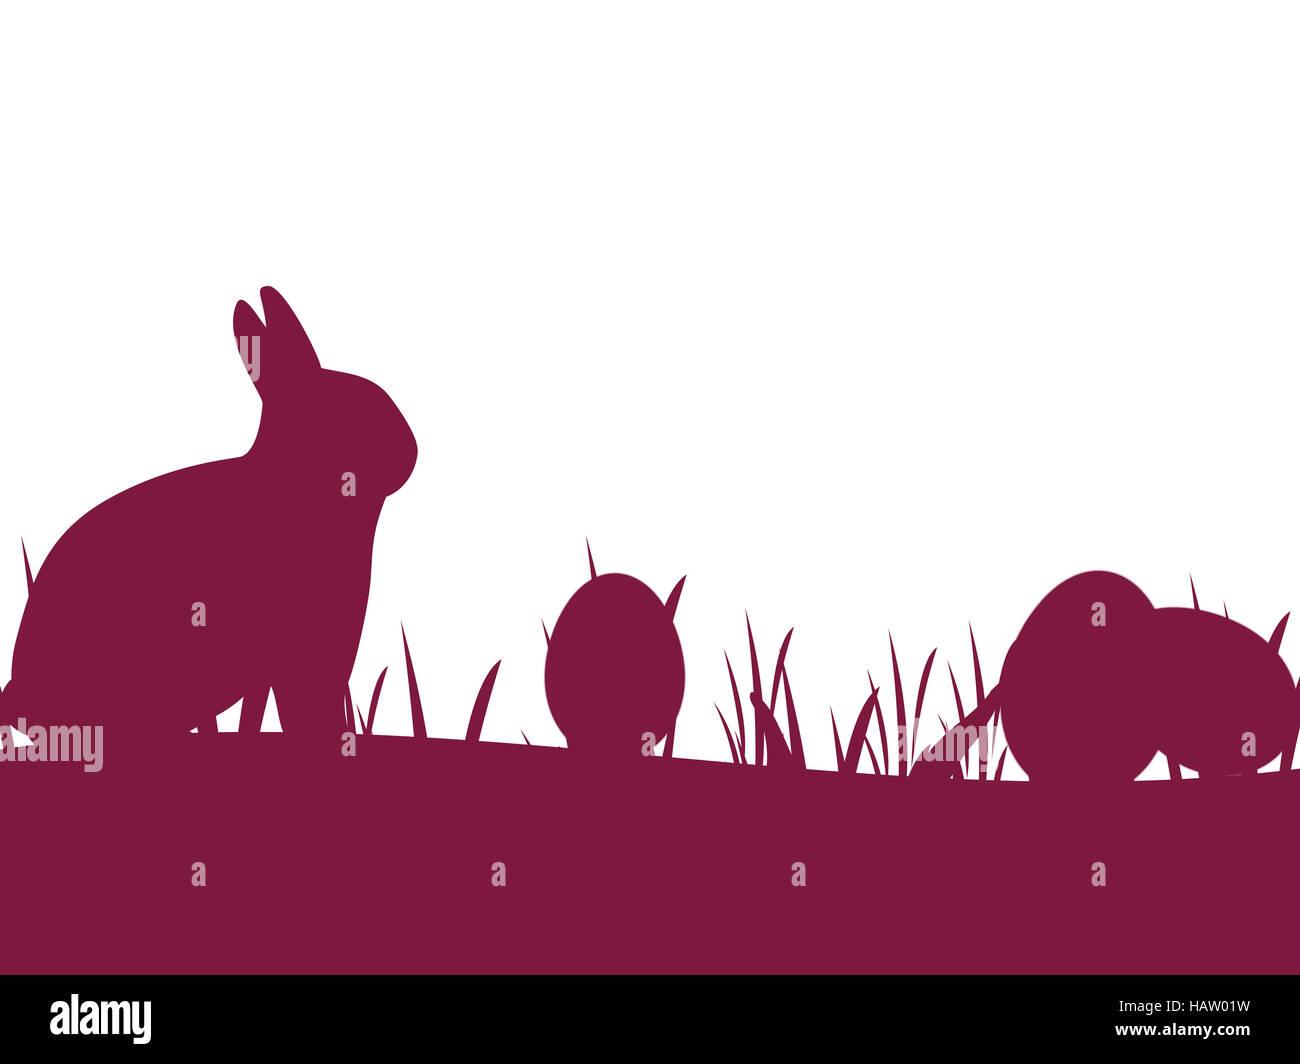 Ostersilhouette lila - Stock Image